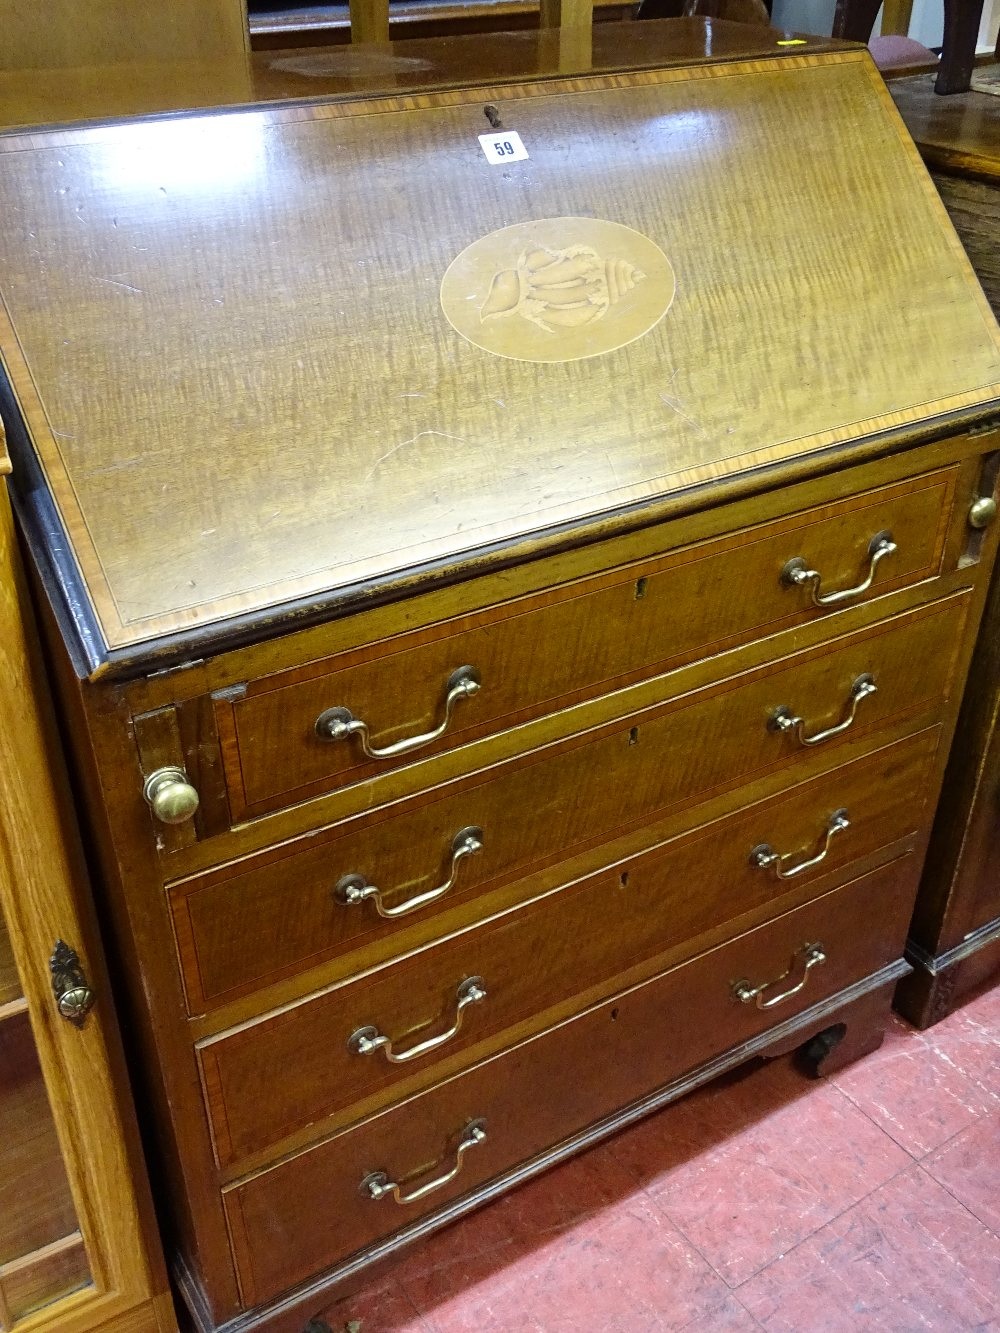 Lot 59 - Edwardian inlaid mahogany fall front bureau with Sheraton shell inlay